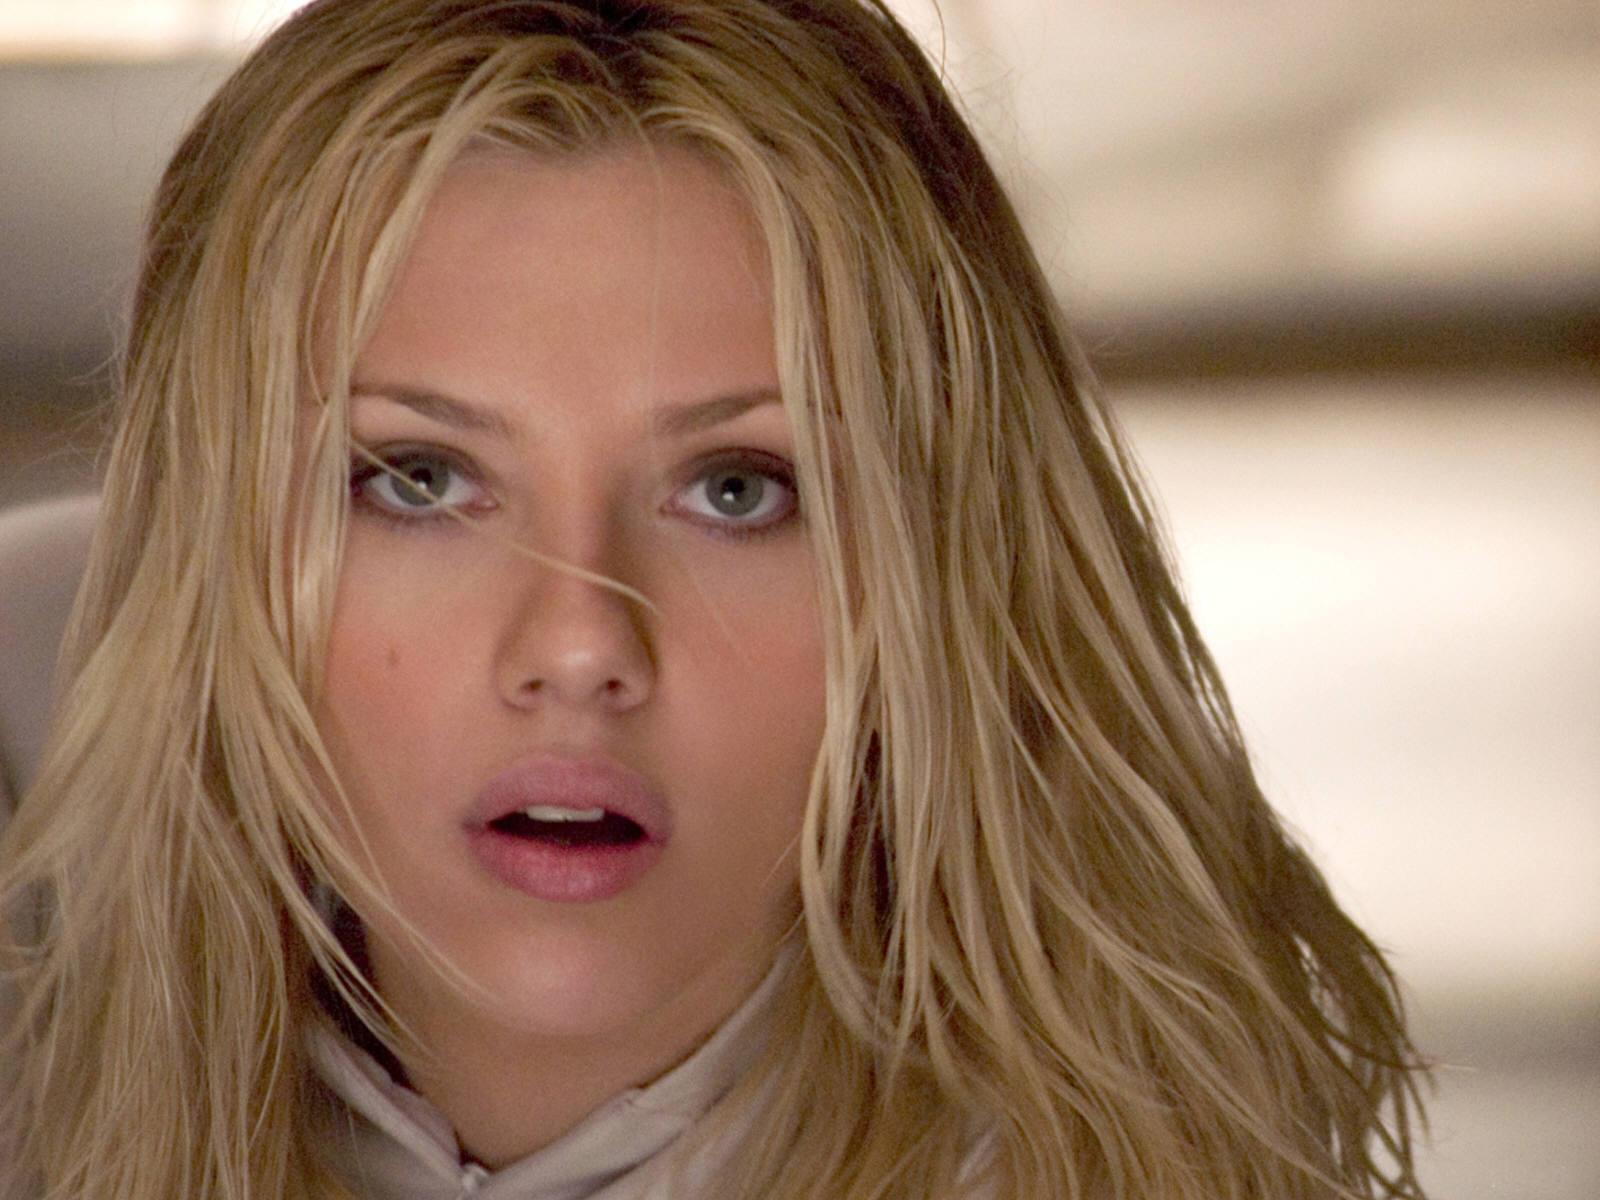 Scarlett Johansson hd image